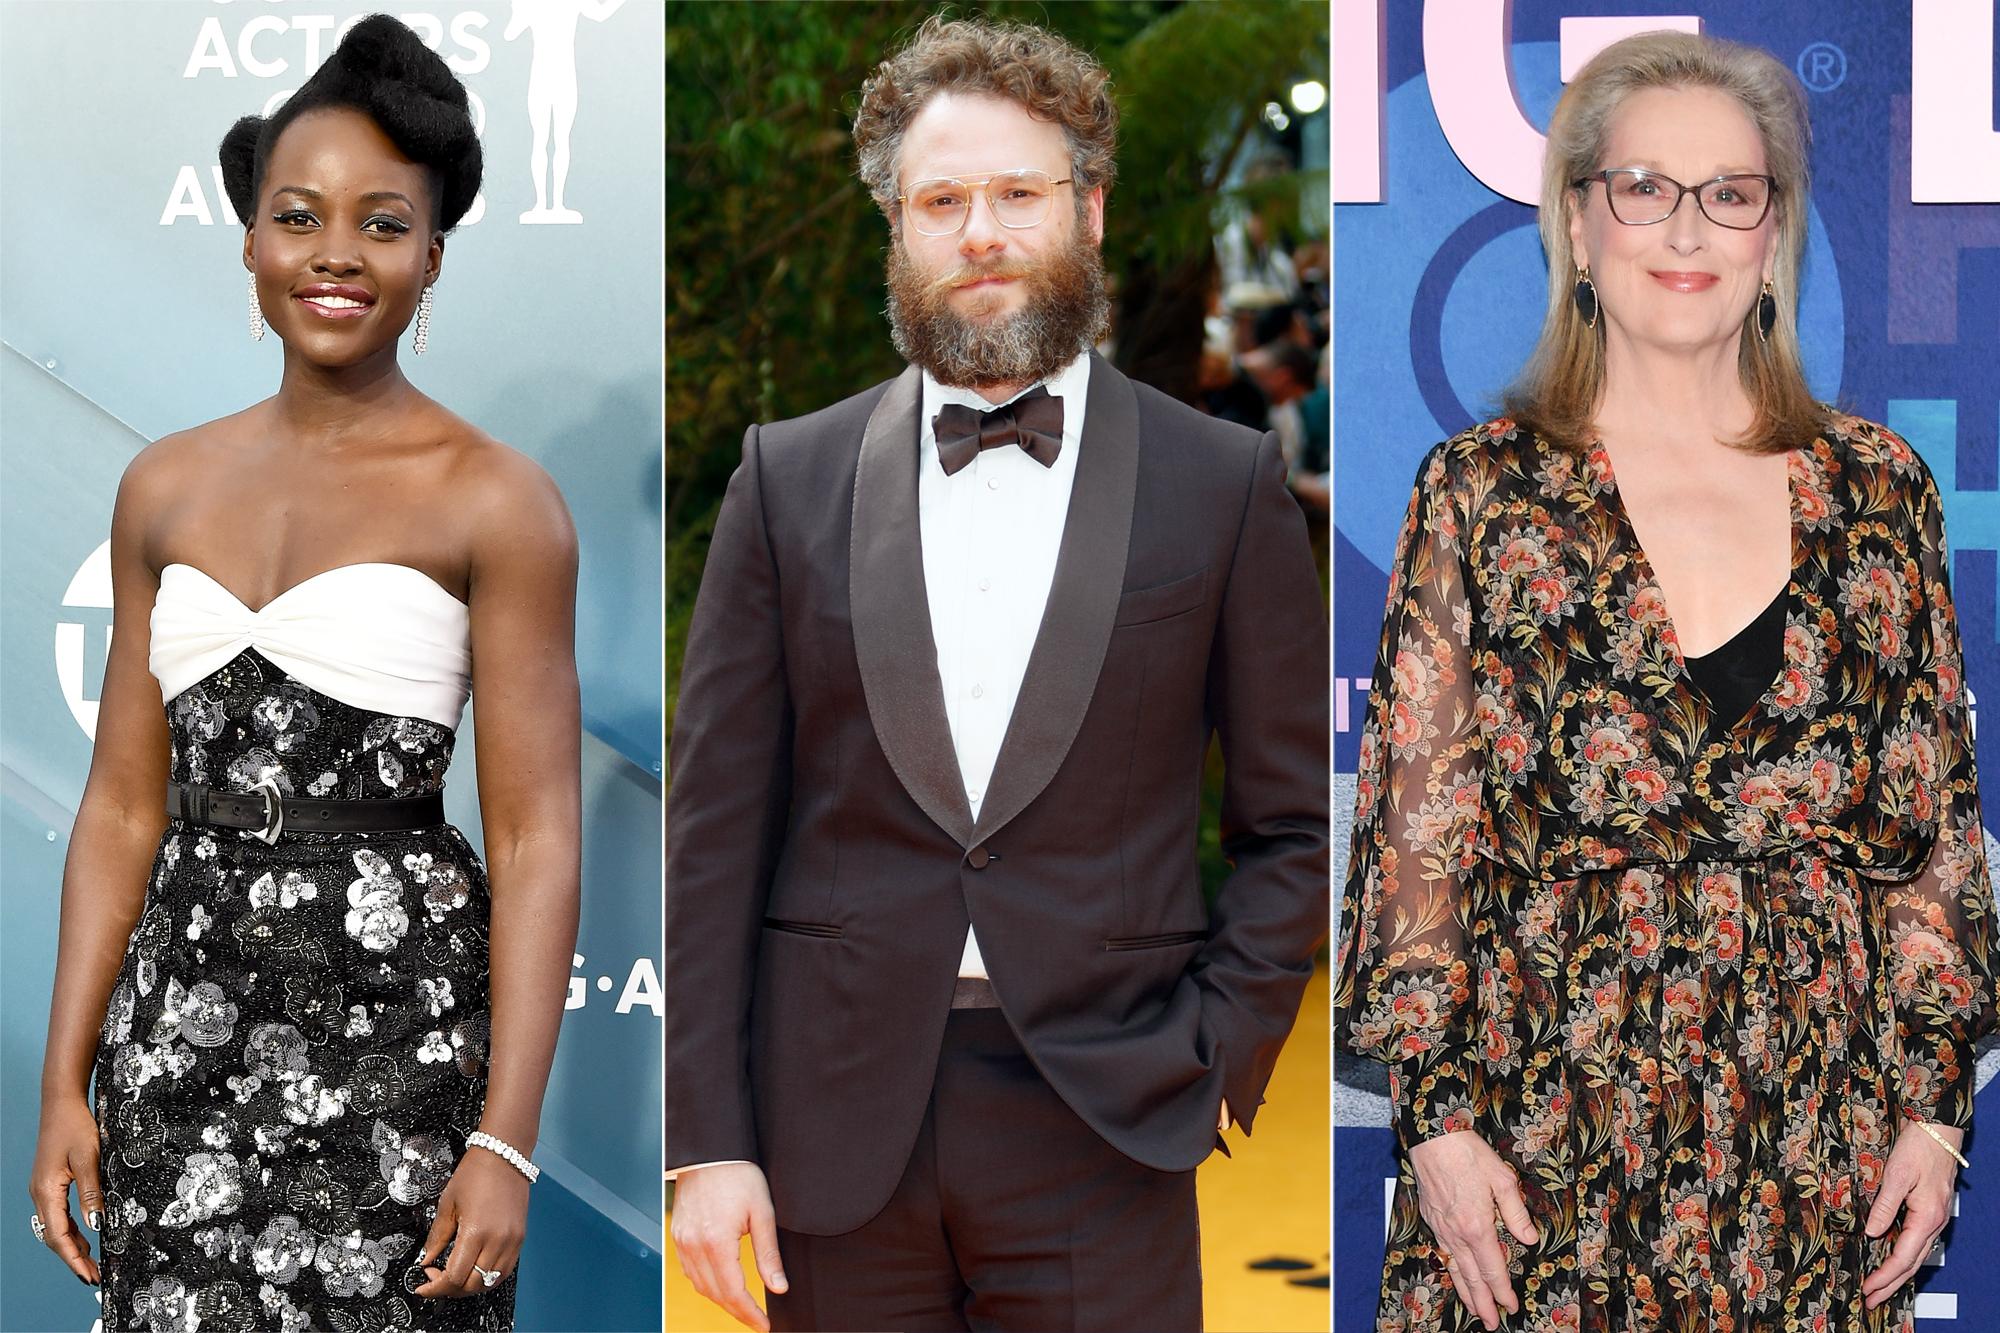 Lupita Nyong'o, Seth Rogen, Meryl Streep